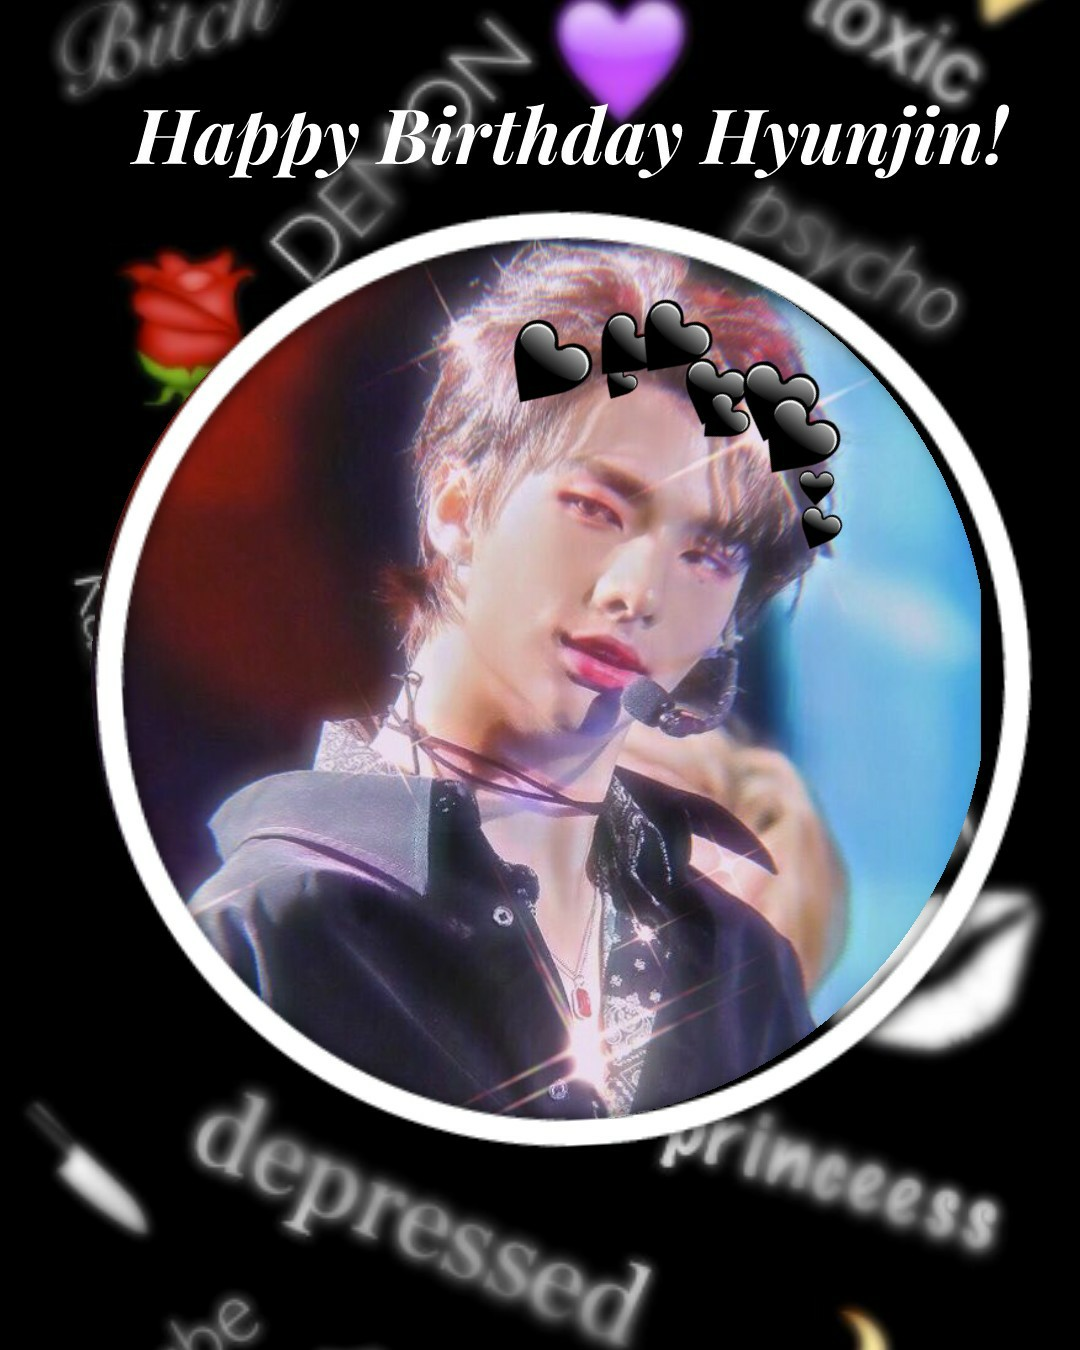 Happy Birthday Hwang Hyun-jin!❤💫